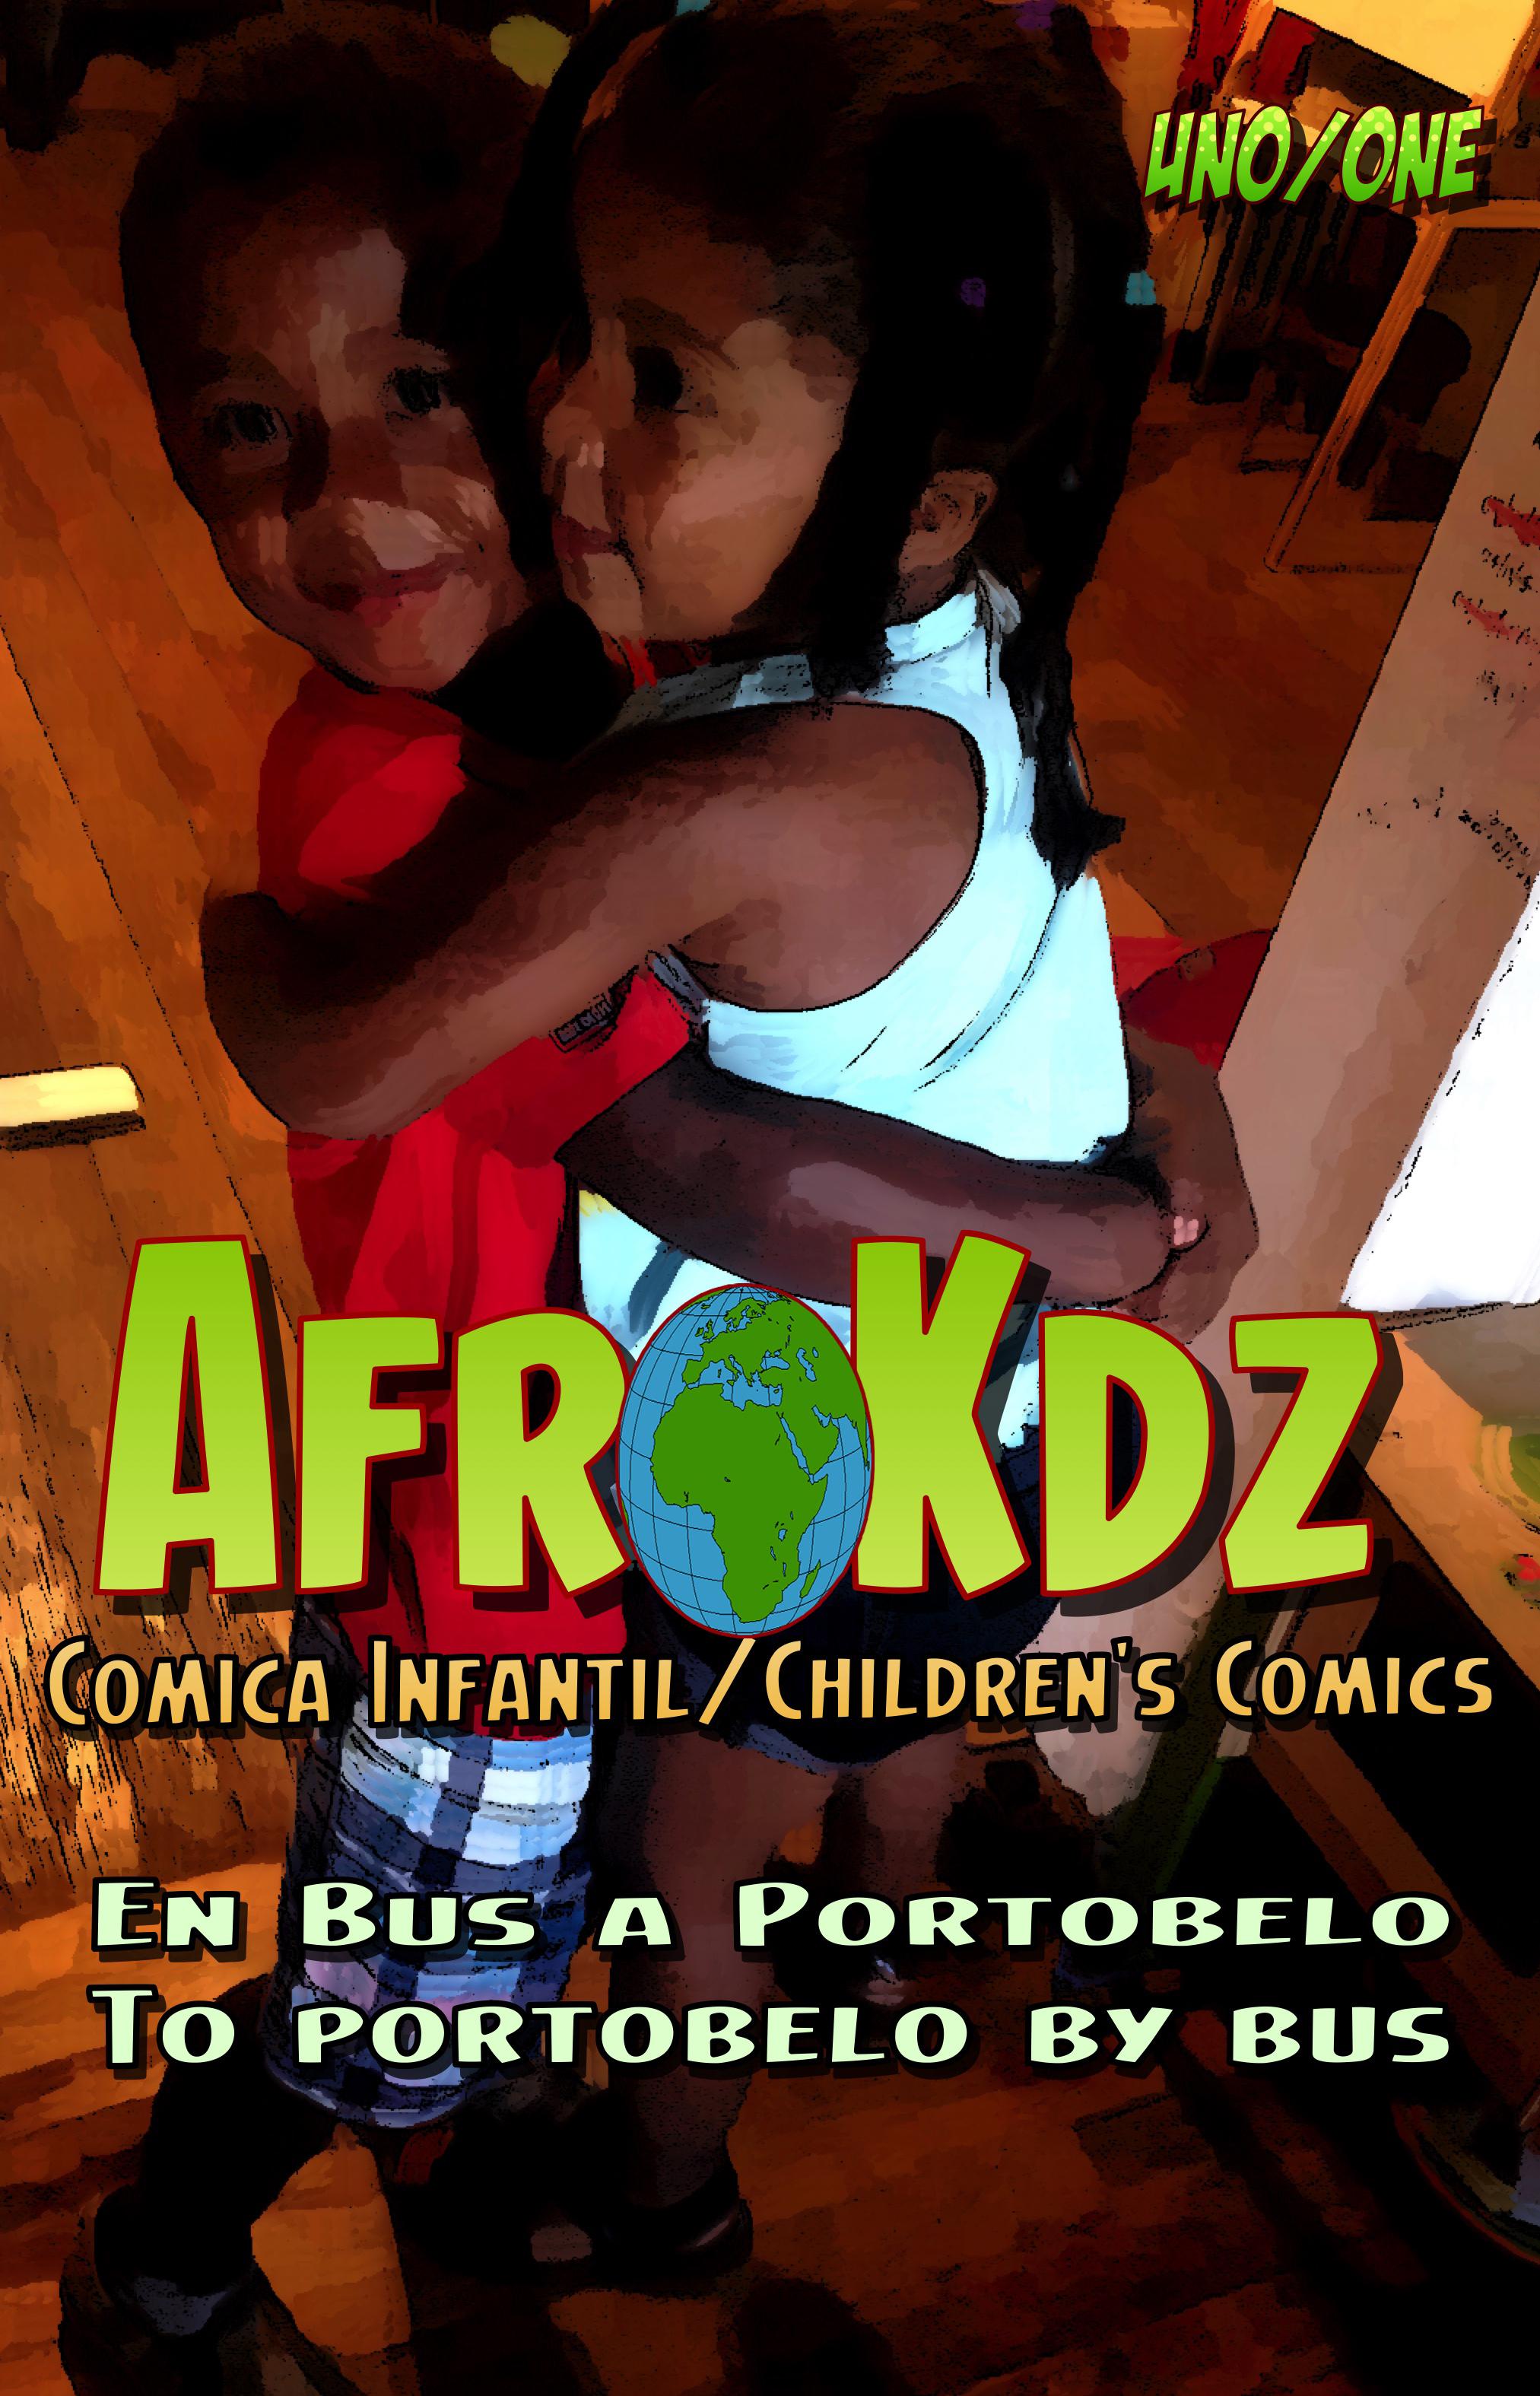 Afrokdz cover